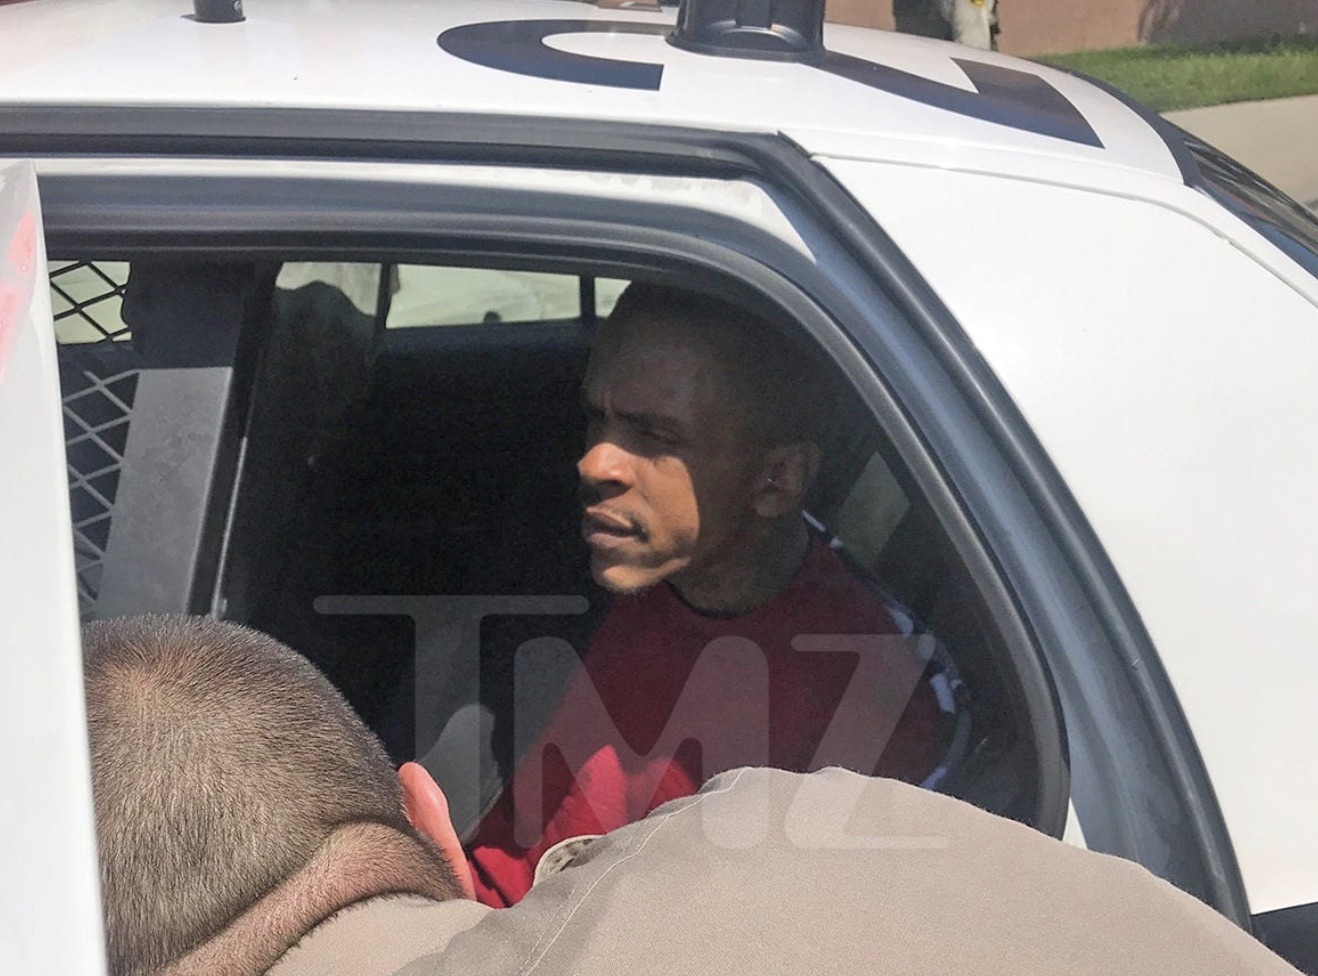 BREAKING NEWS: Suspect In Nipsey Hussle Murder Captured In